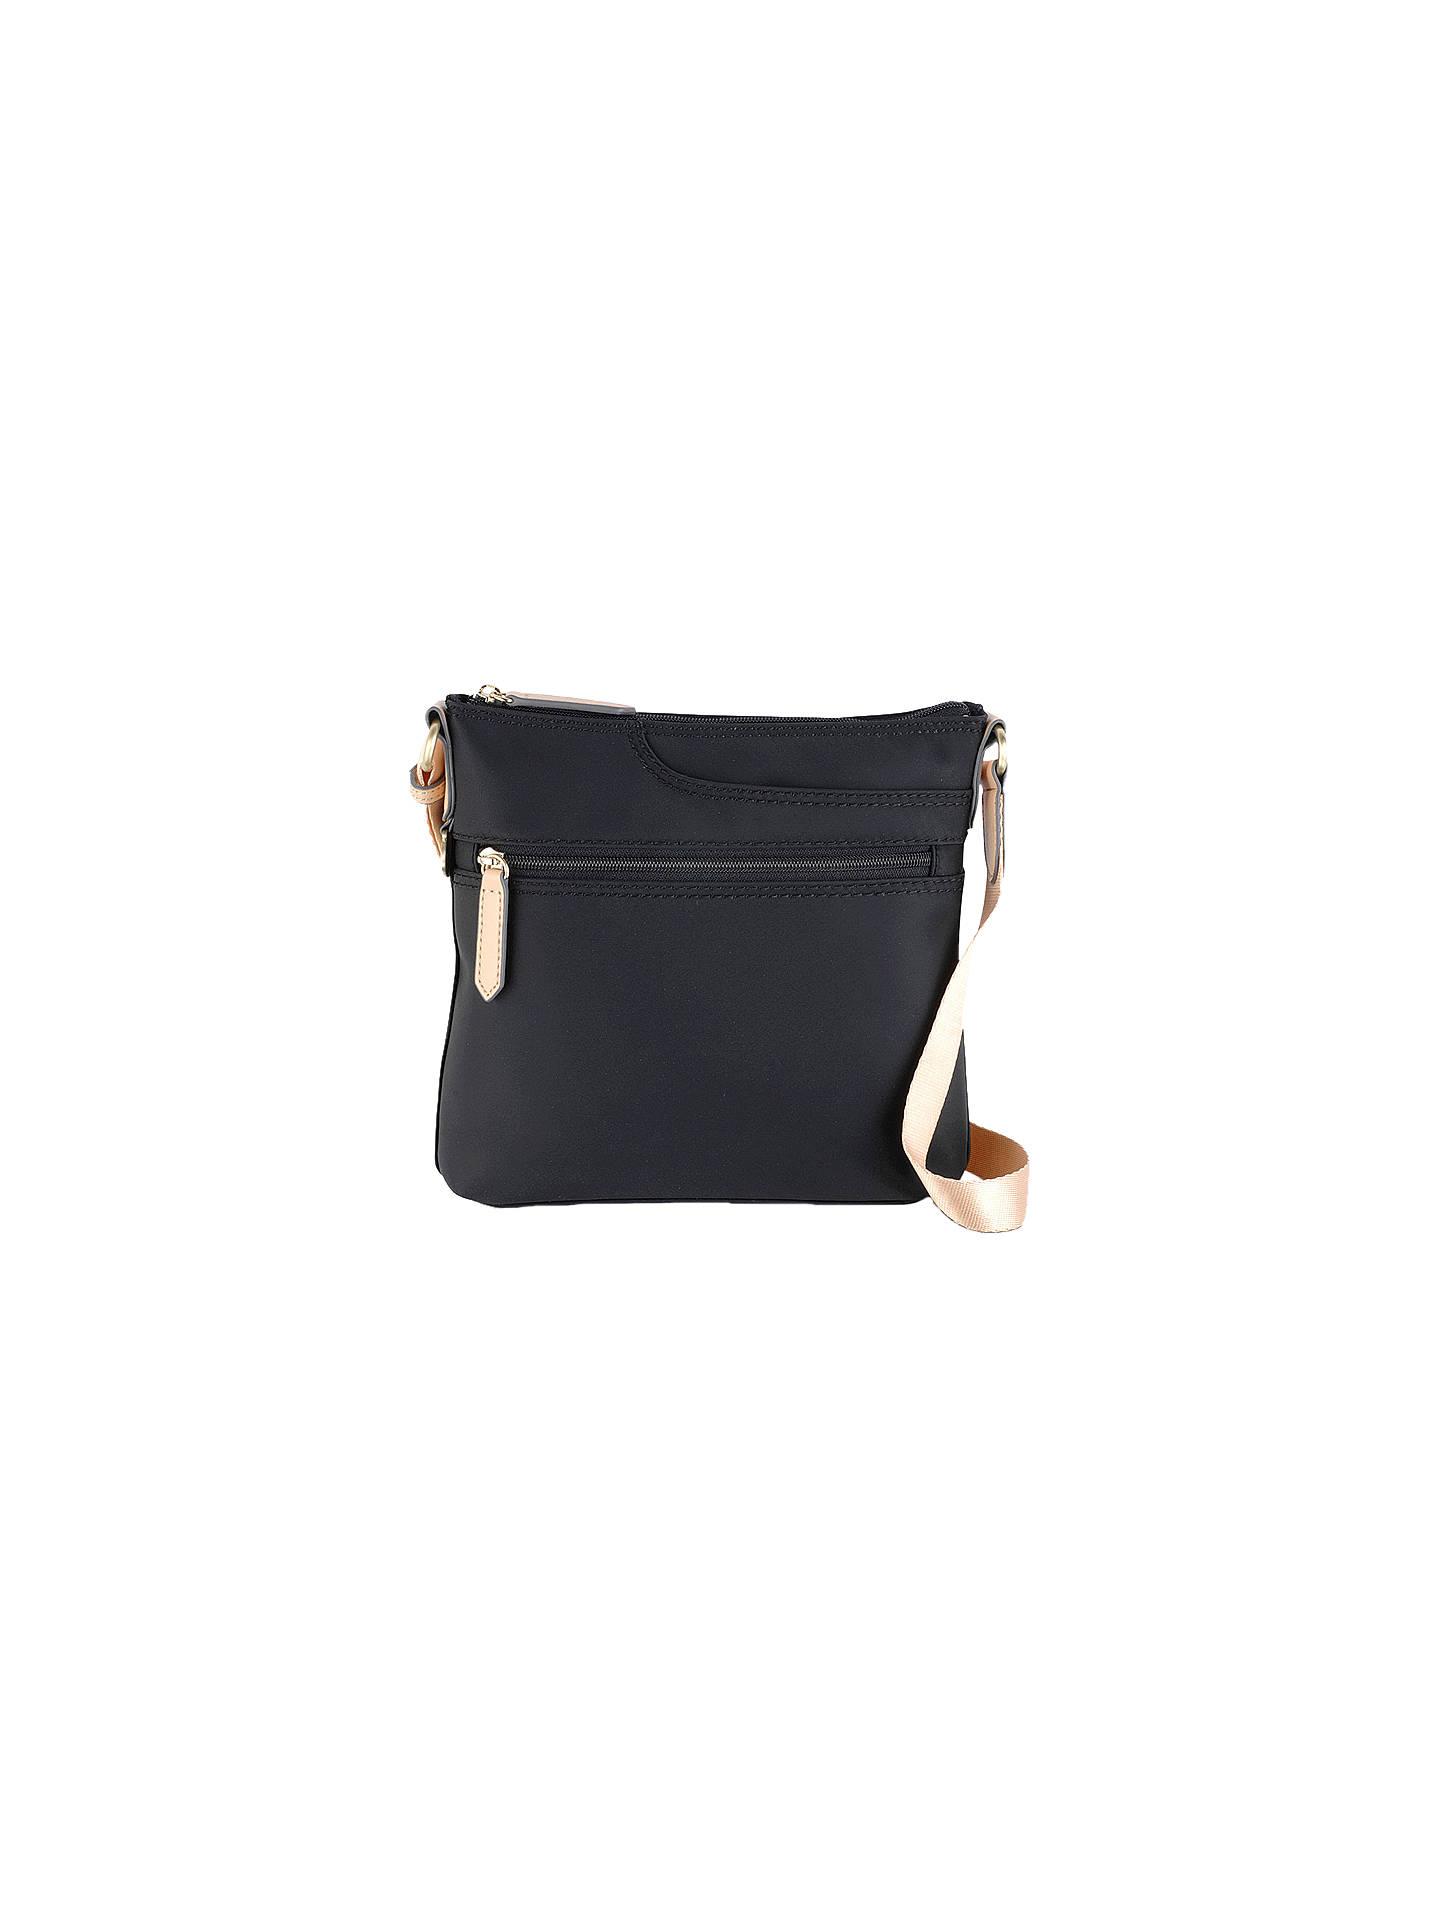 fafa44183e87 Buy Radley Pocket Essentials Small Cross Body Bag